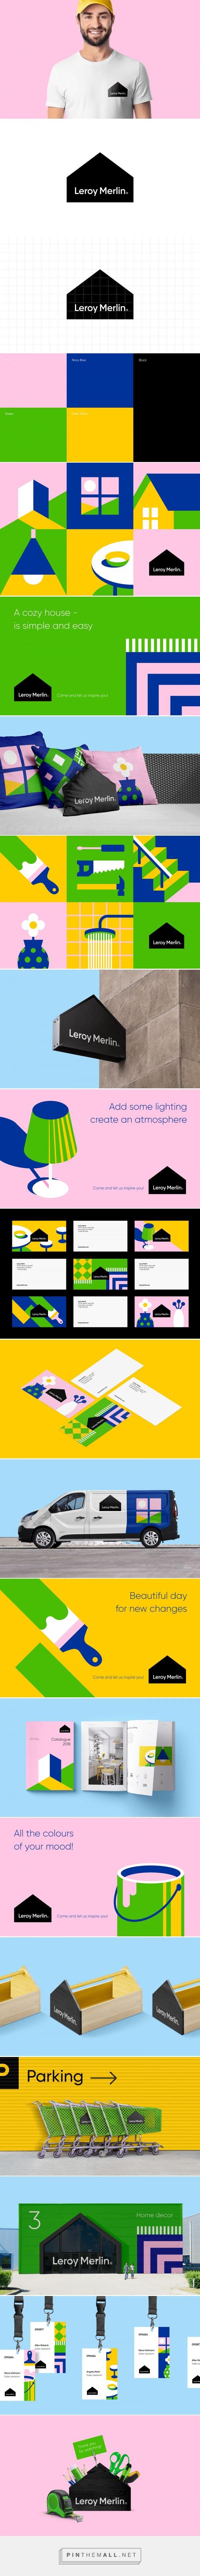 Leroy Merlin By Berik Yergaliyev On Behance Branding Design Logo Design Inspiration Branding